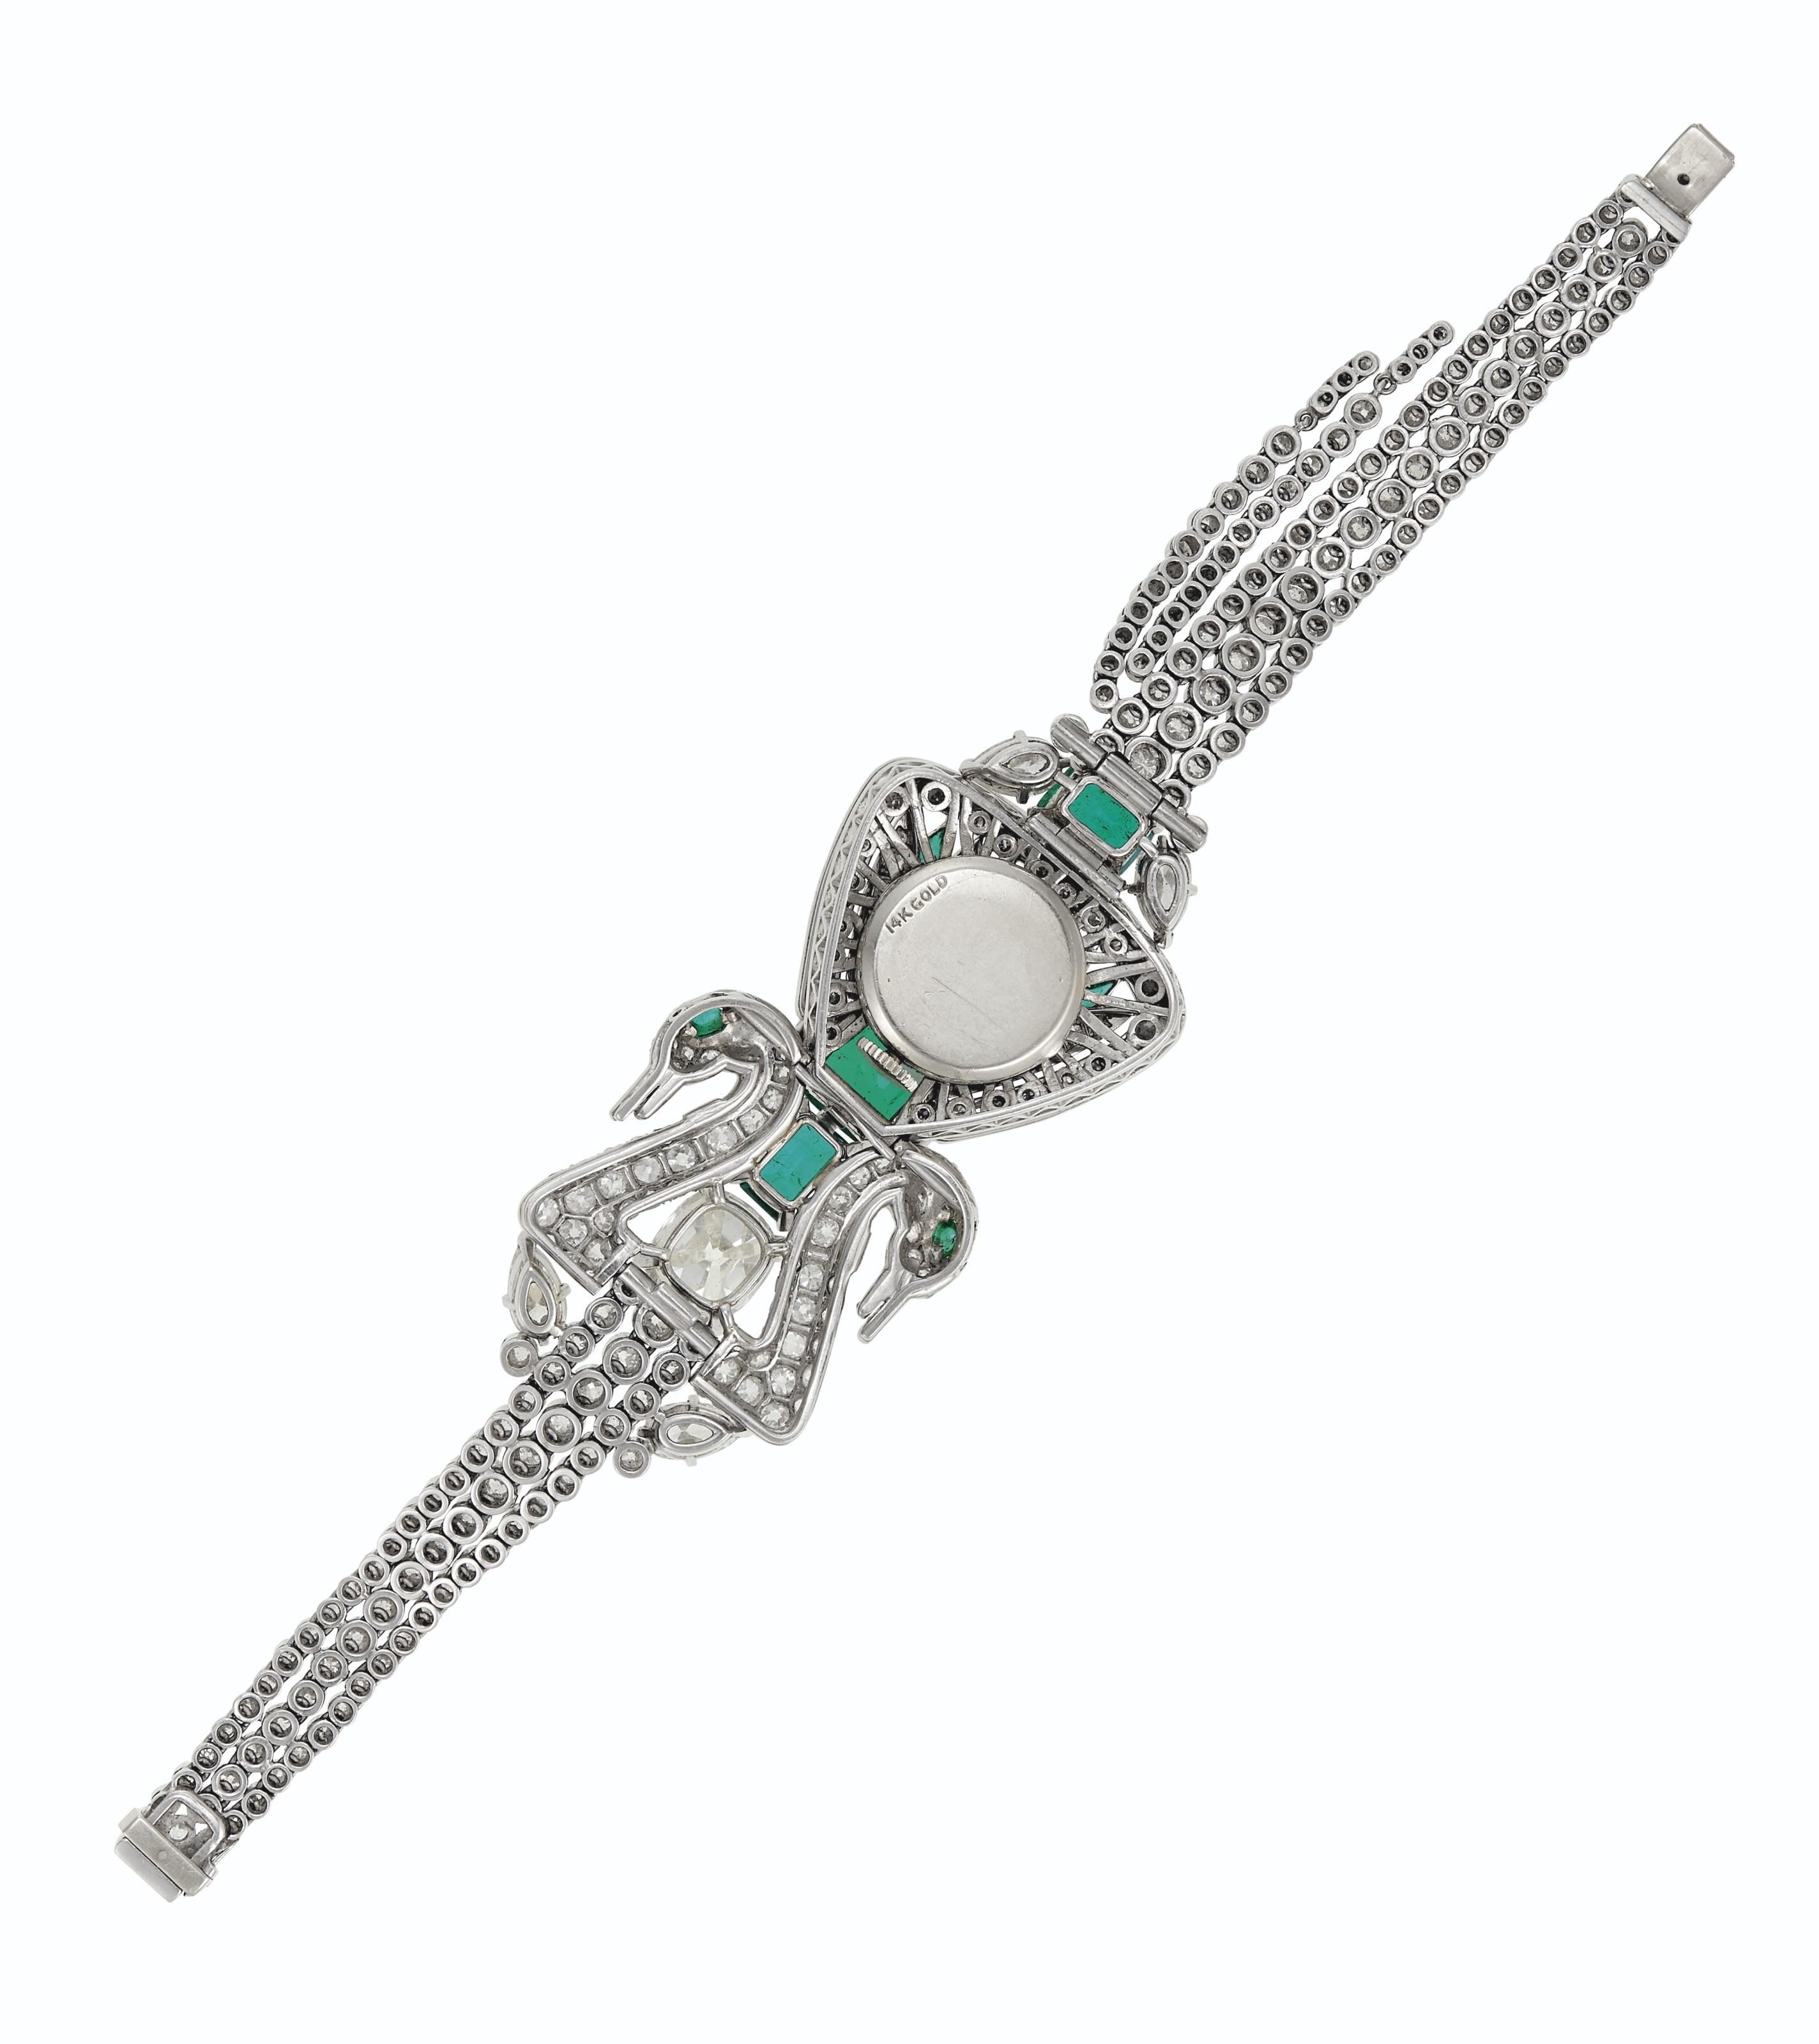 DIAMOND, EMERALD AND MULTI-GEM DOUBLE-SWAN CONCEALED WATCH-BRACELET